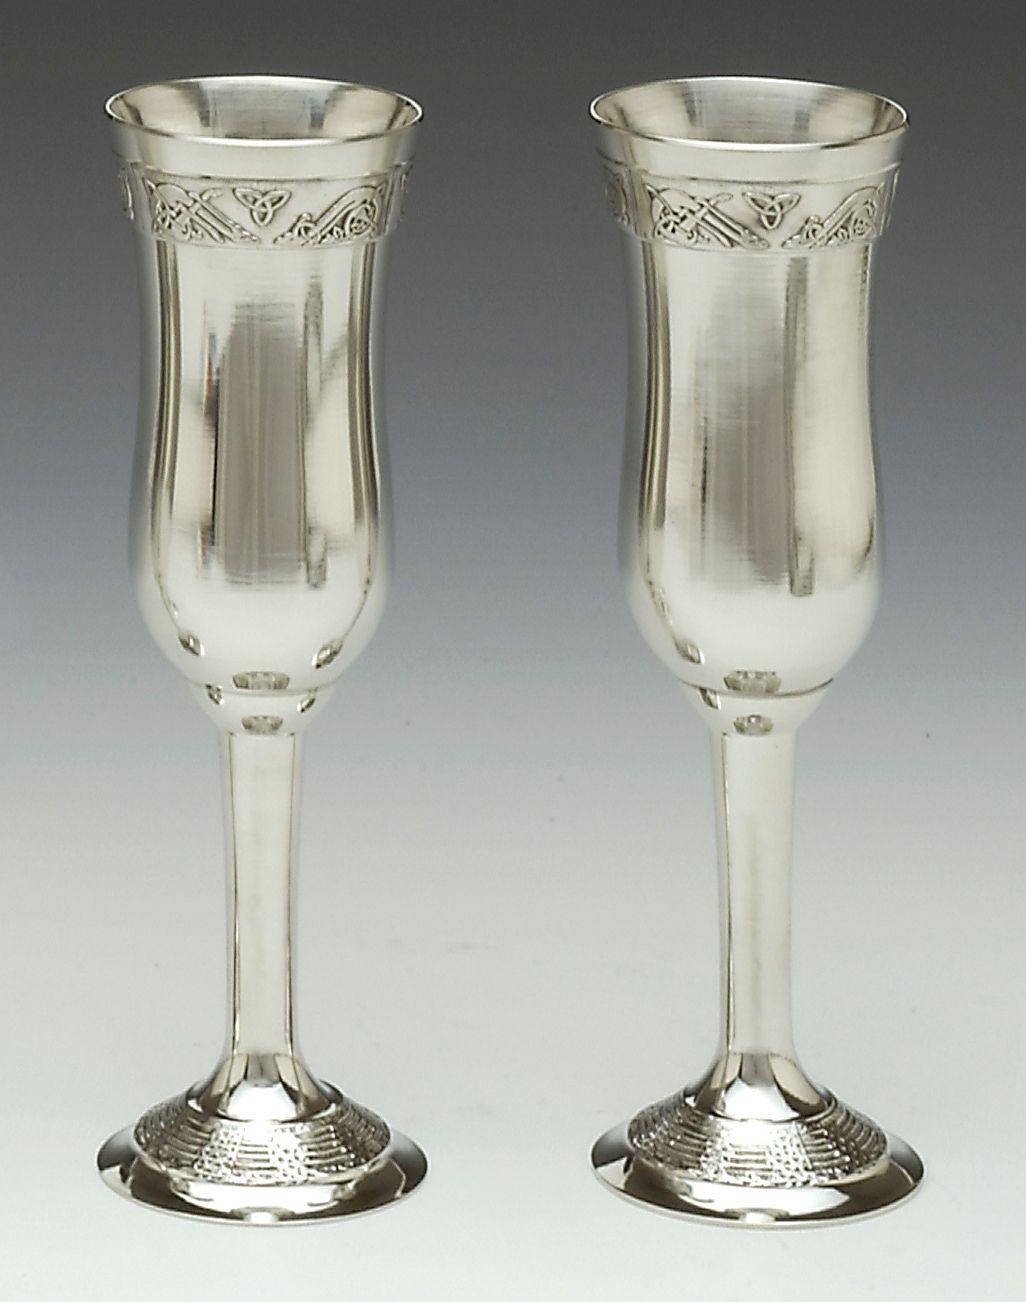 Wedding Champagne Flutes | Irish Wedding Gift - Celtic Champagne ...